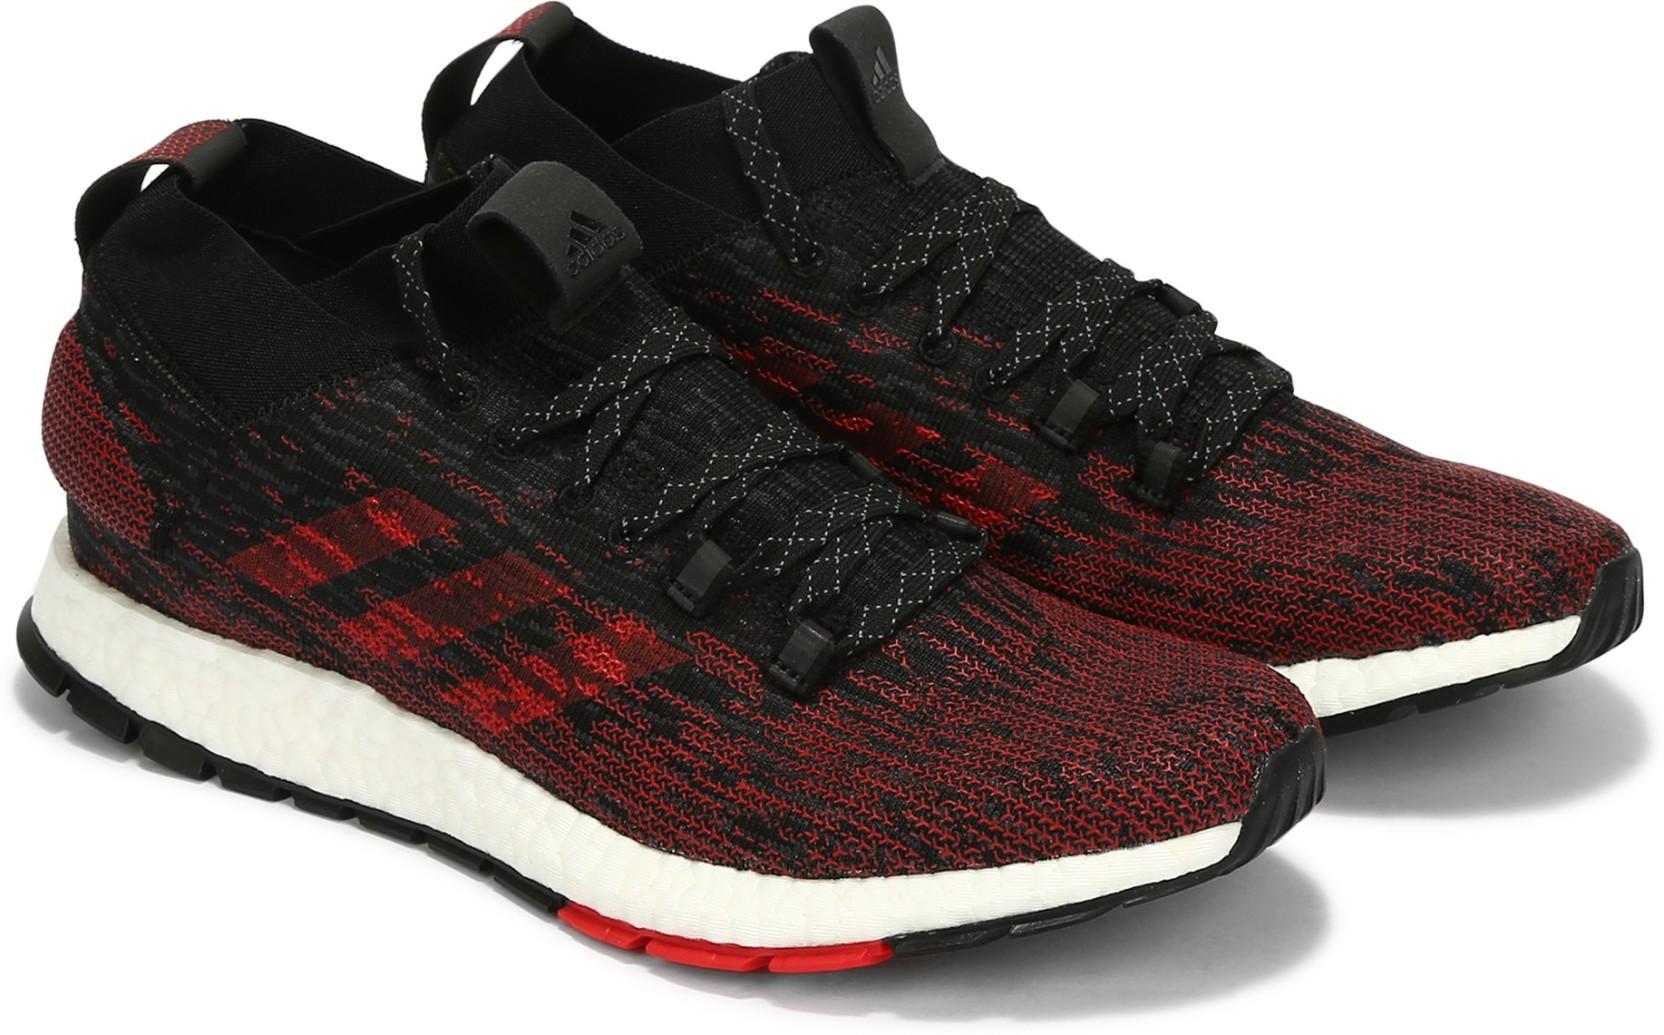 dd2c7d729b95 ADIDAS PUREBOOST RBL Running Shoes For Men - Buy ADIDAS PUREBOOST ...